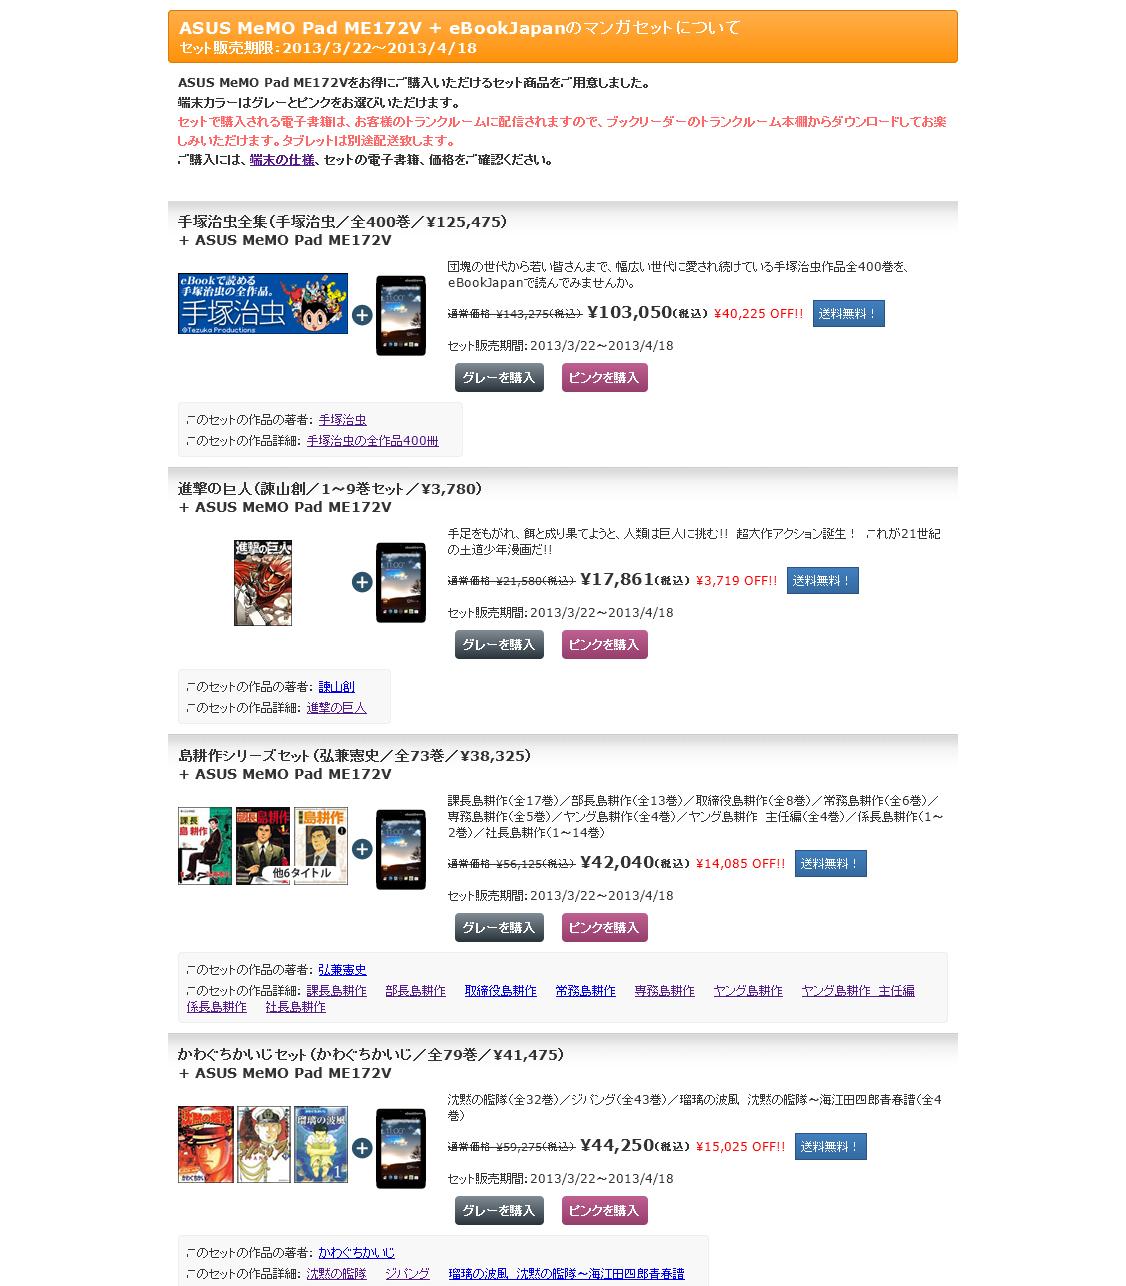 eBookJapan 全巻セット販売ページ